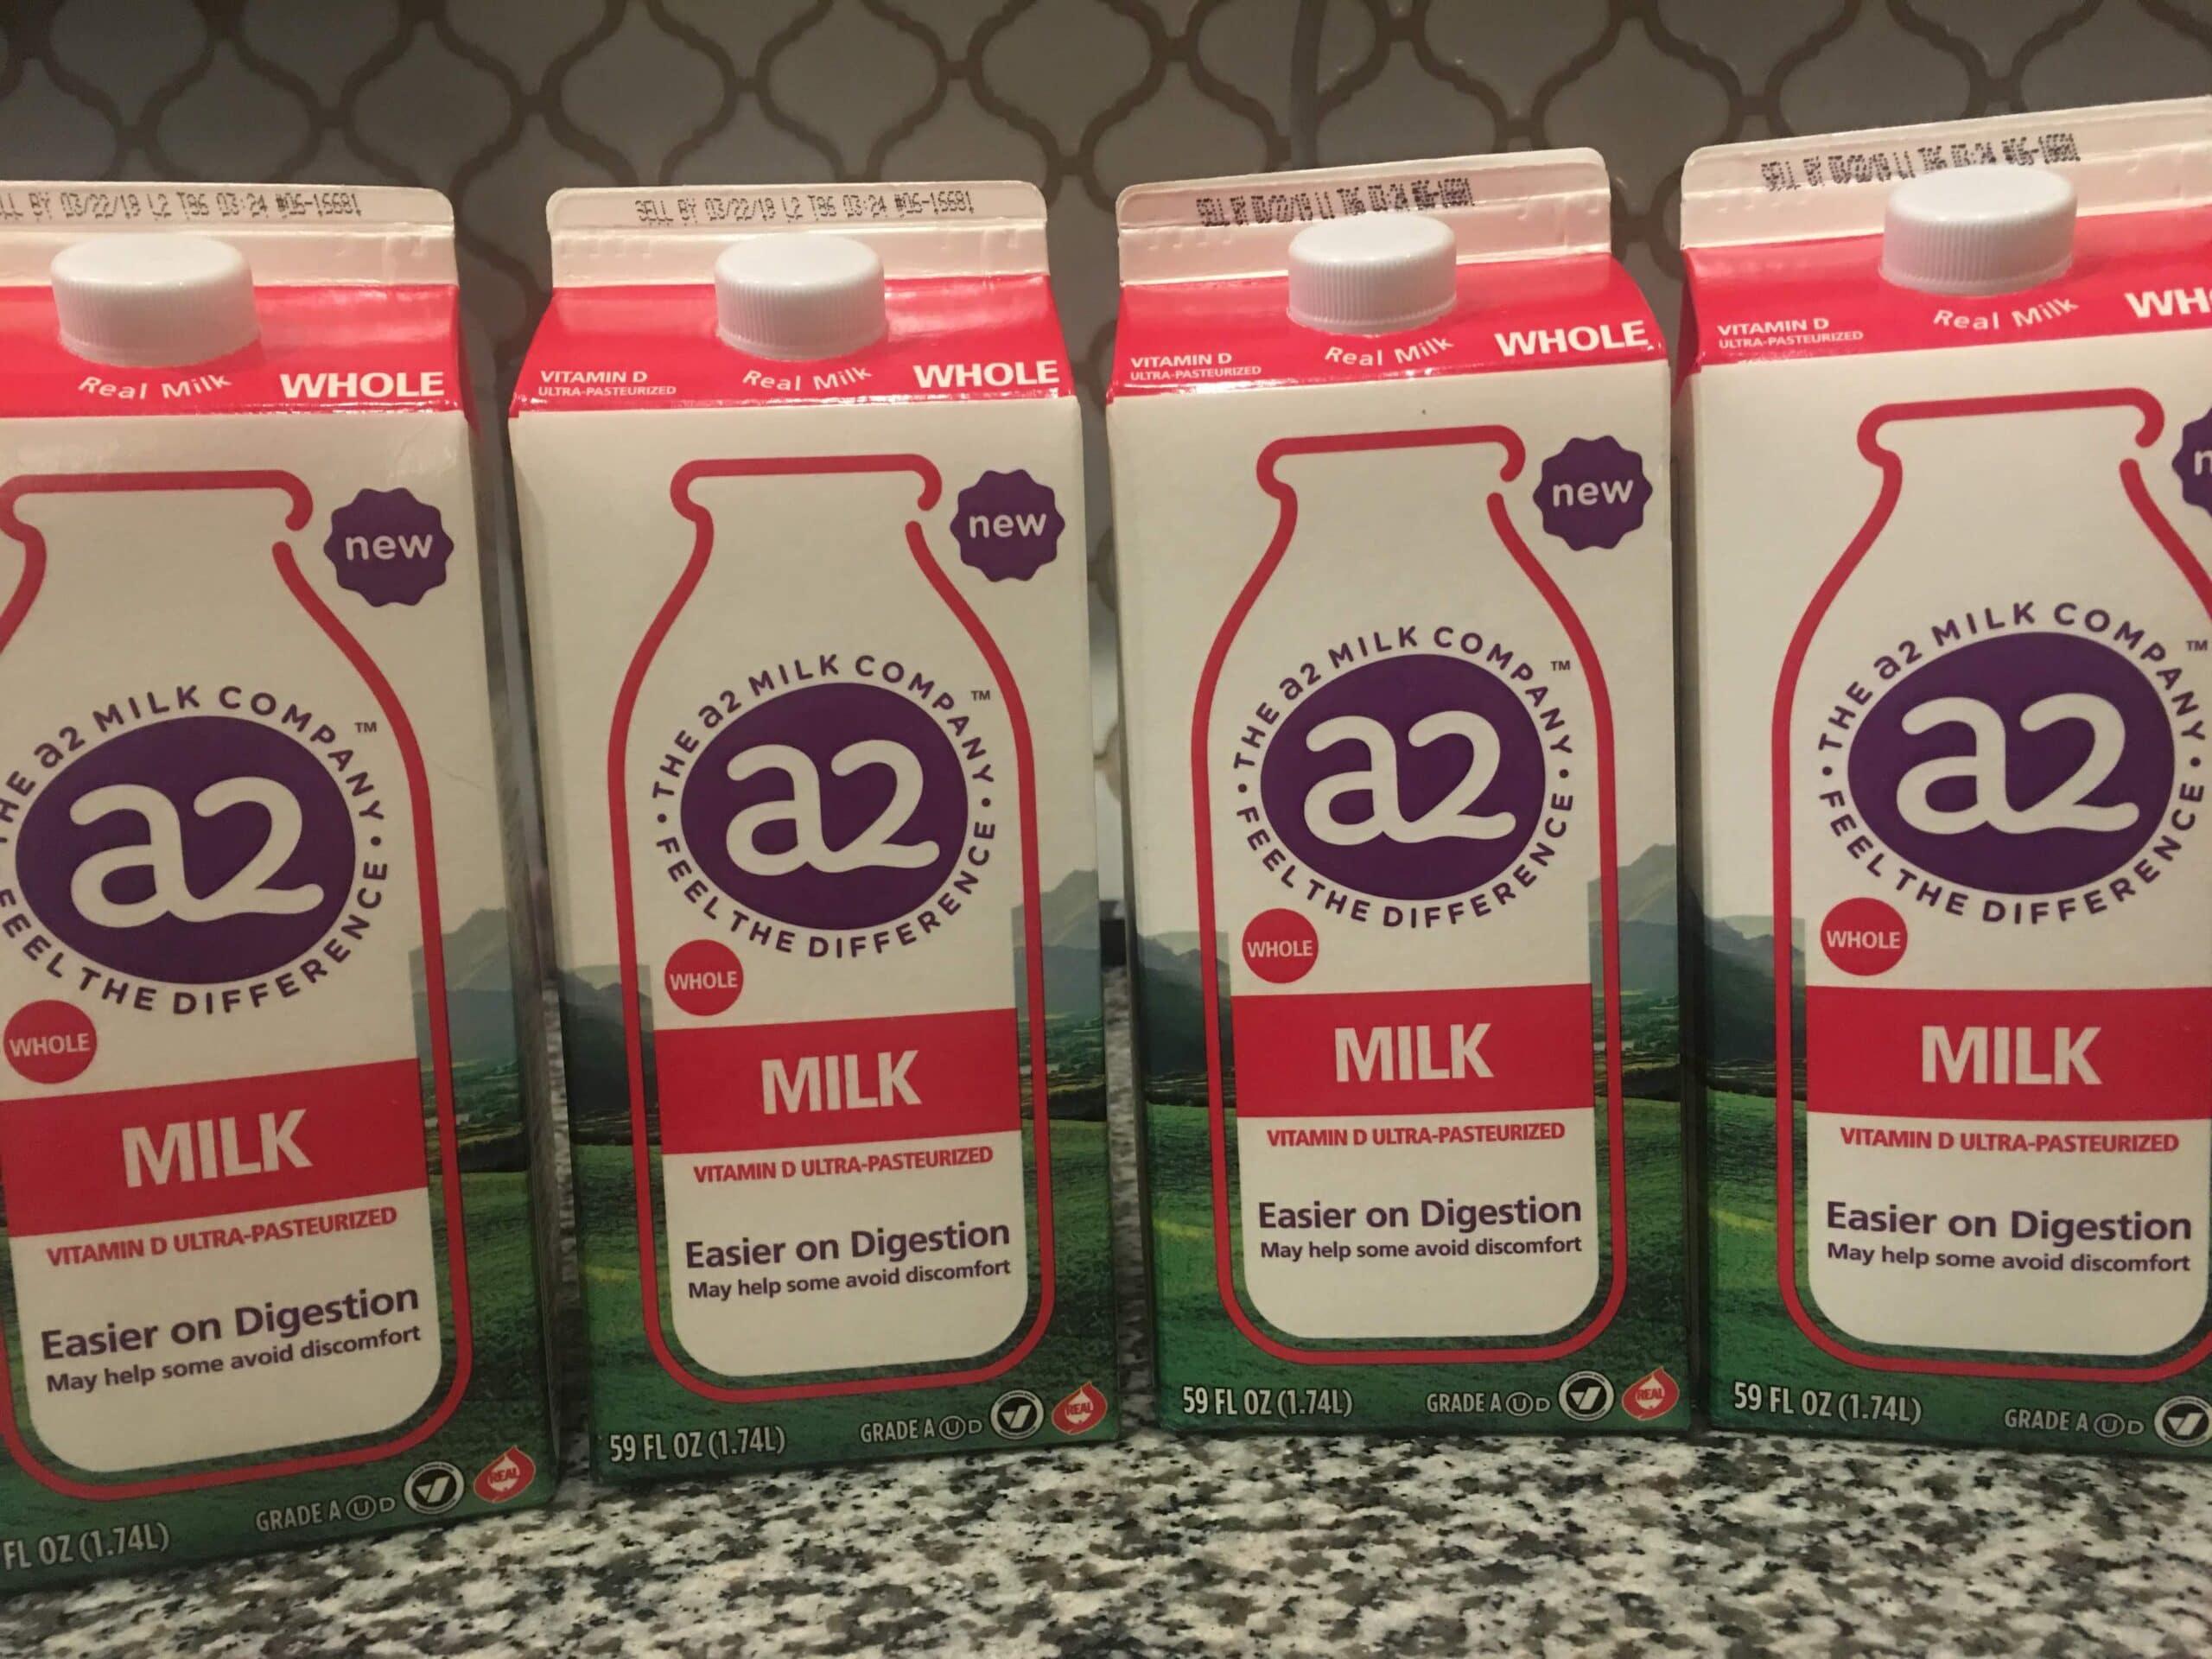 5 cartons of a2 milk, whole milk